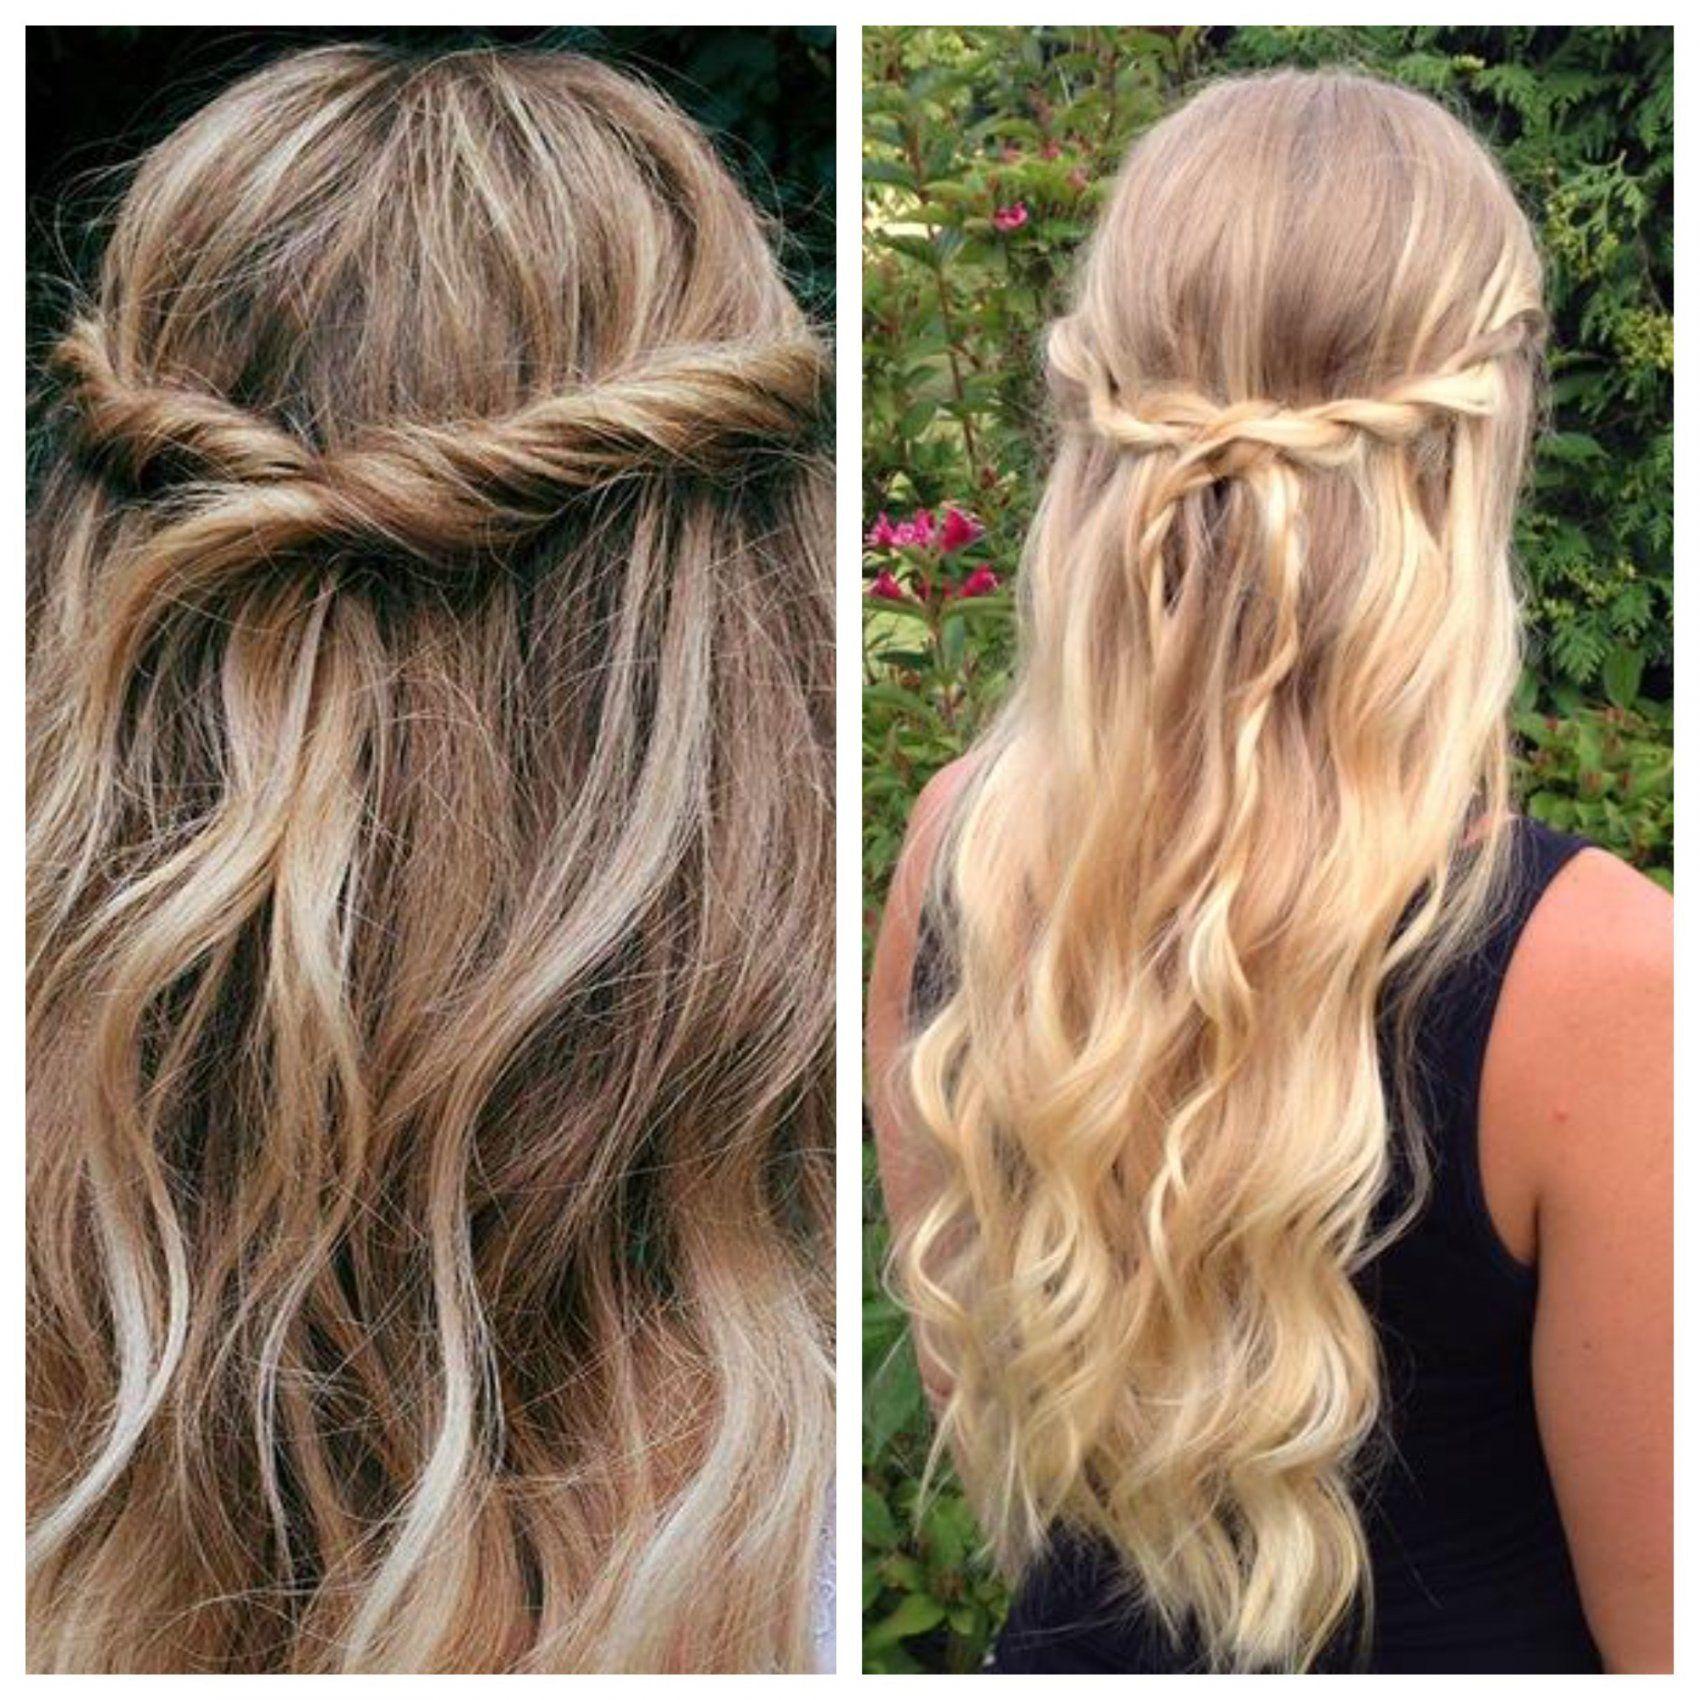 Easy Half Up Half Down Hairstyles Bridal Hair Half Up